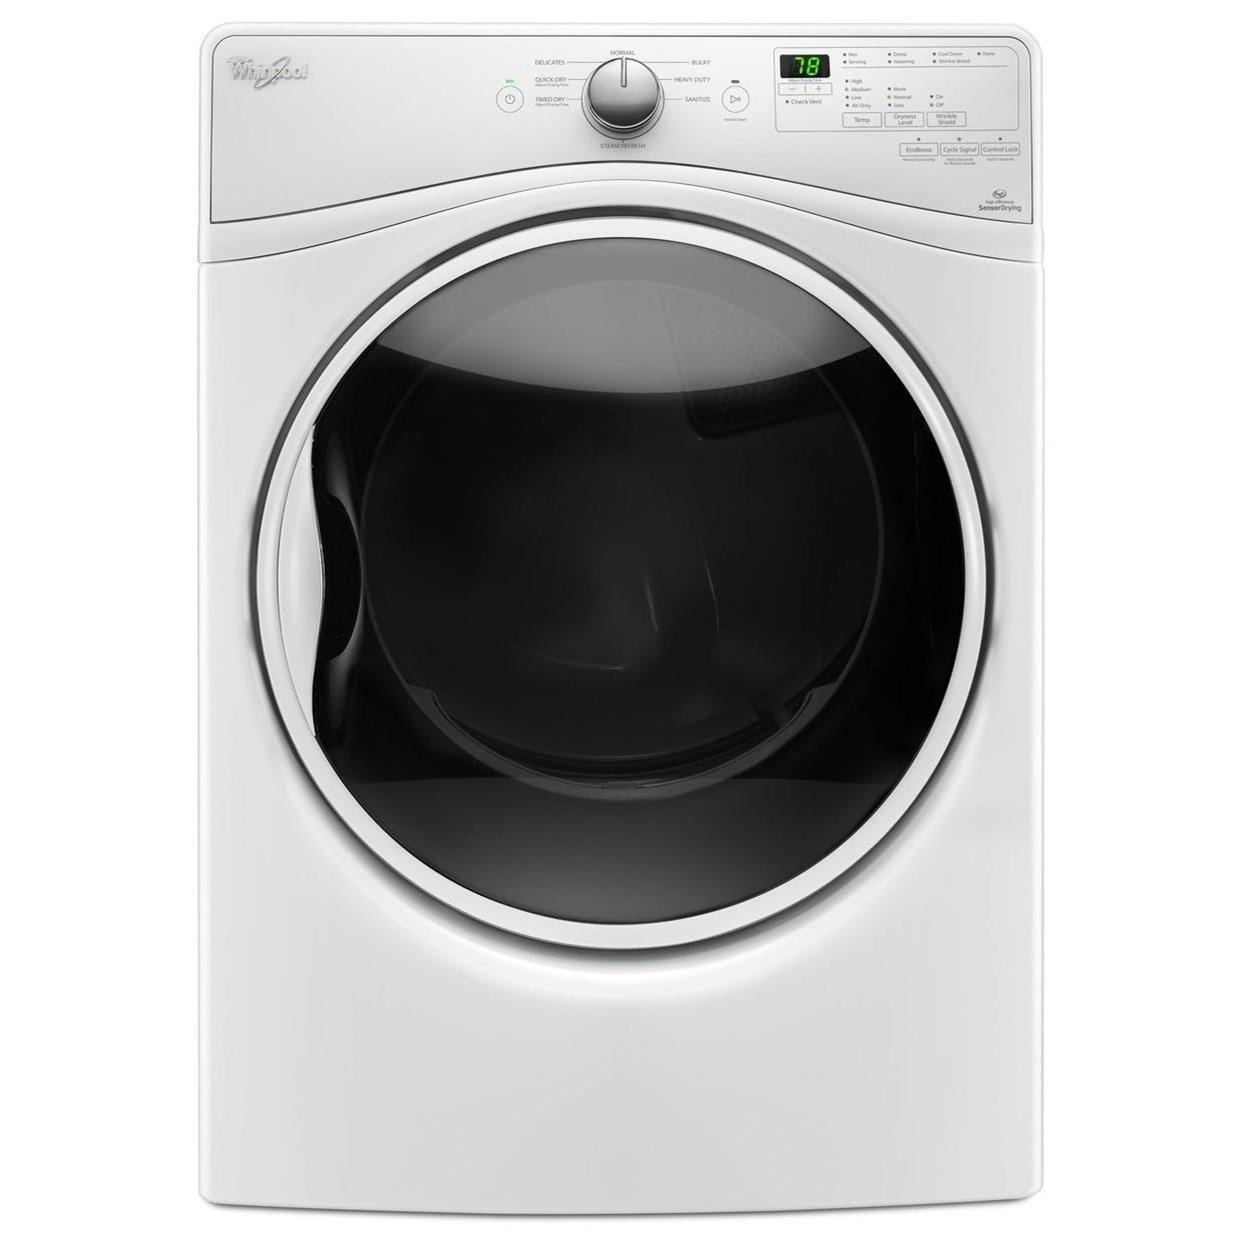 Whirlpool Gas Dryers 7.4 cu. ft. Gas Dryer - Item Number: WGD85HEFW